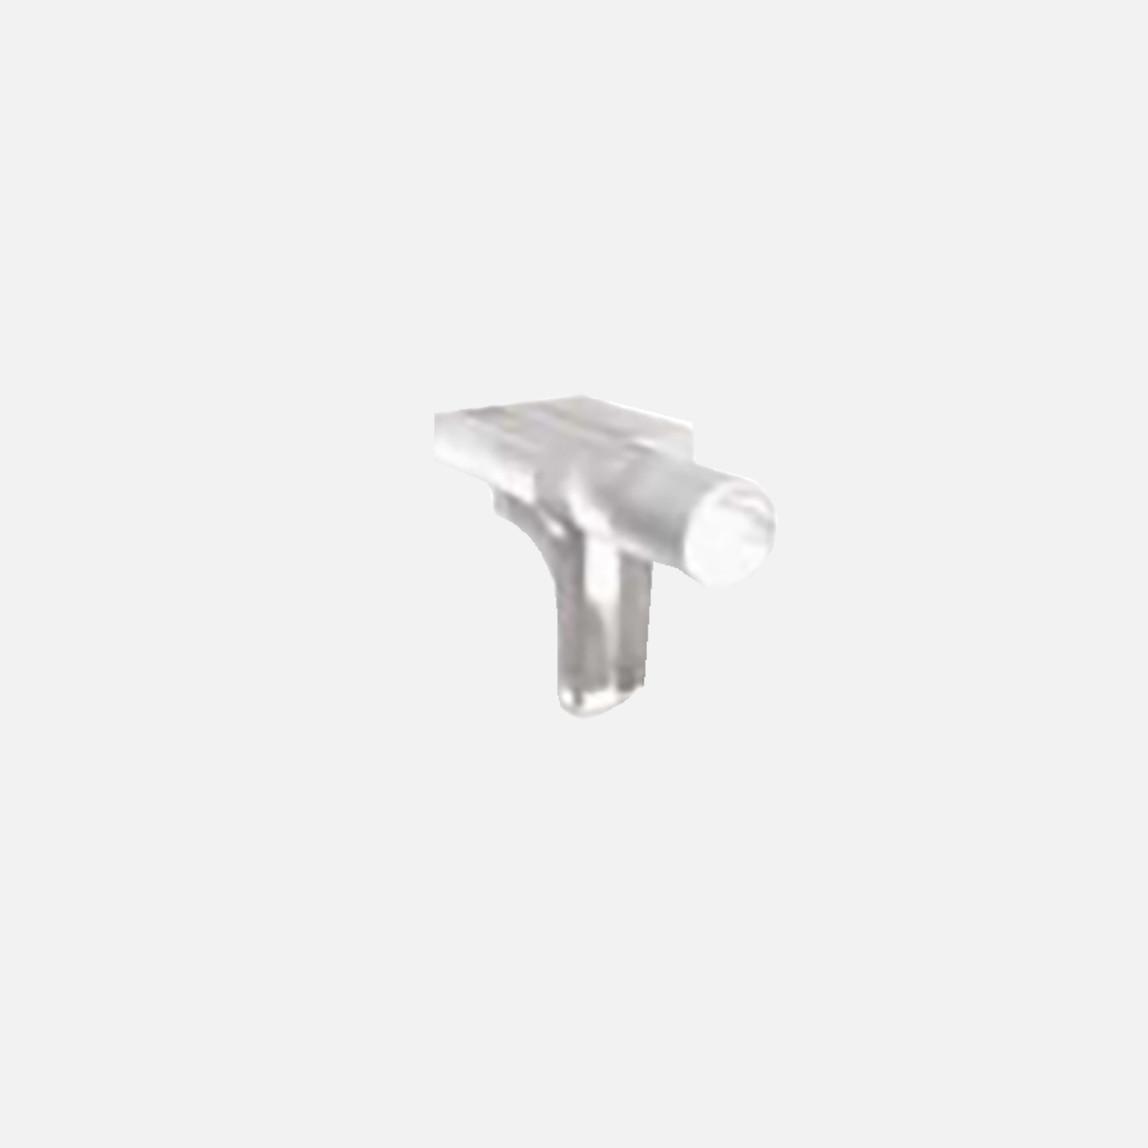 Plastik Dübelli Raf Pimi 6 Mm Beyaz 20' li